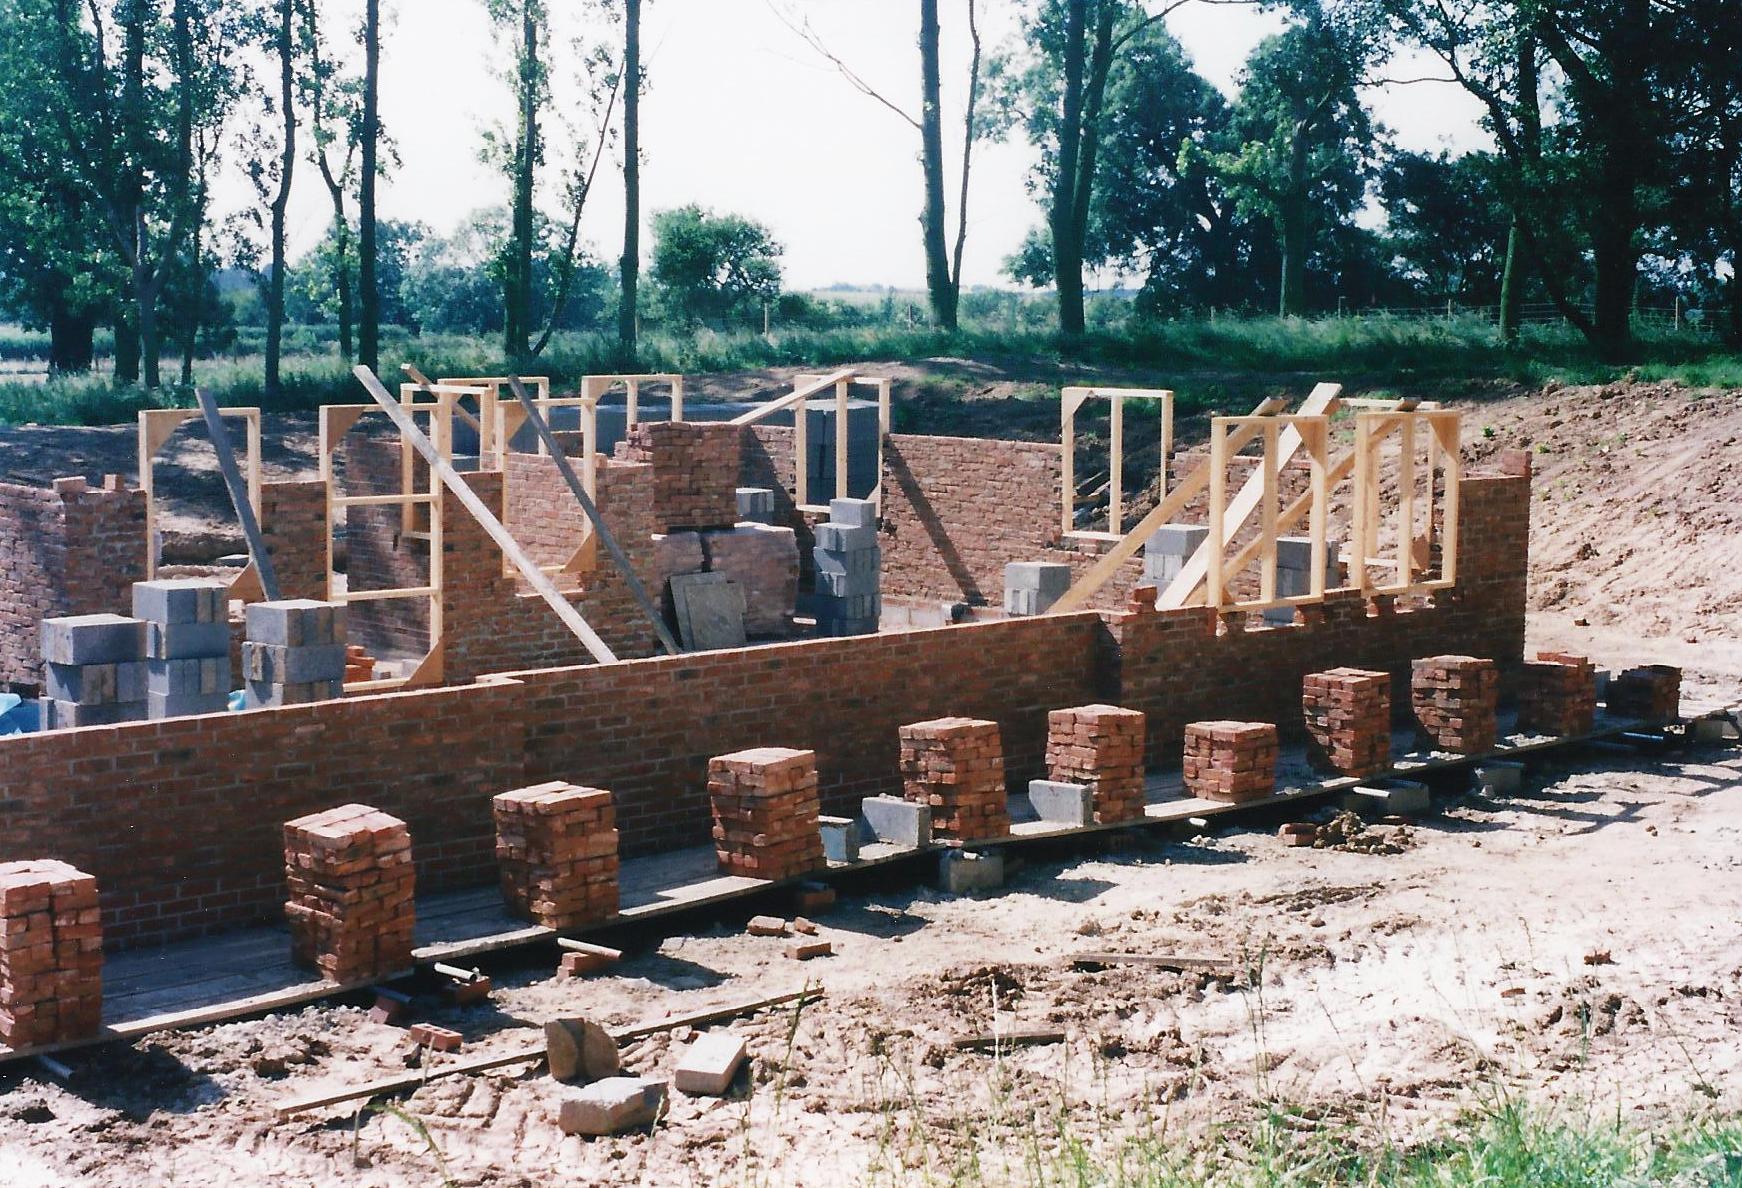 North End Farm Construction 3 - East Yorkshire Architects - Samuel Kendall Associates.jpg